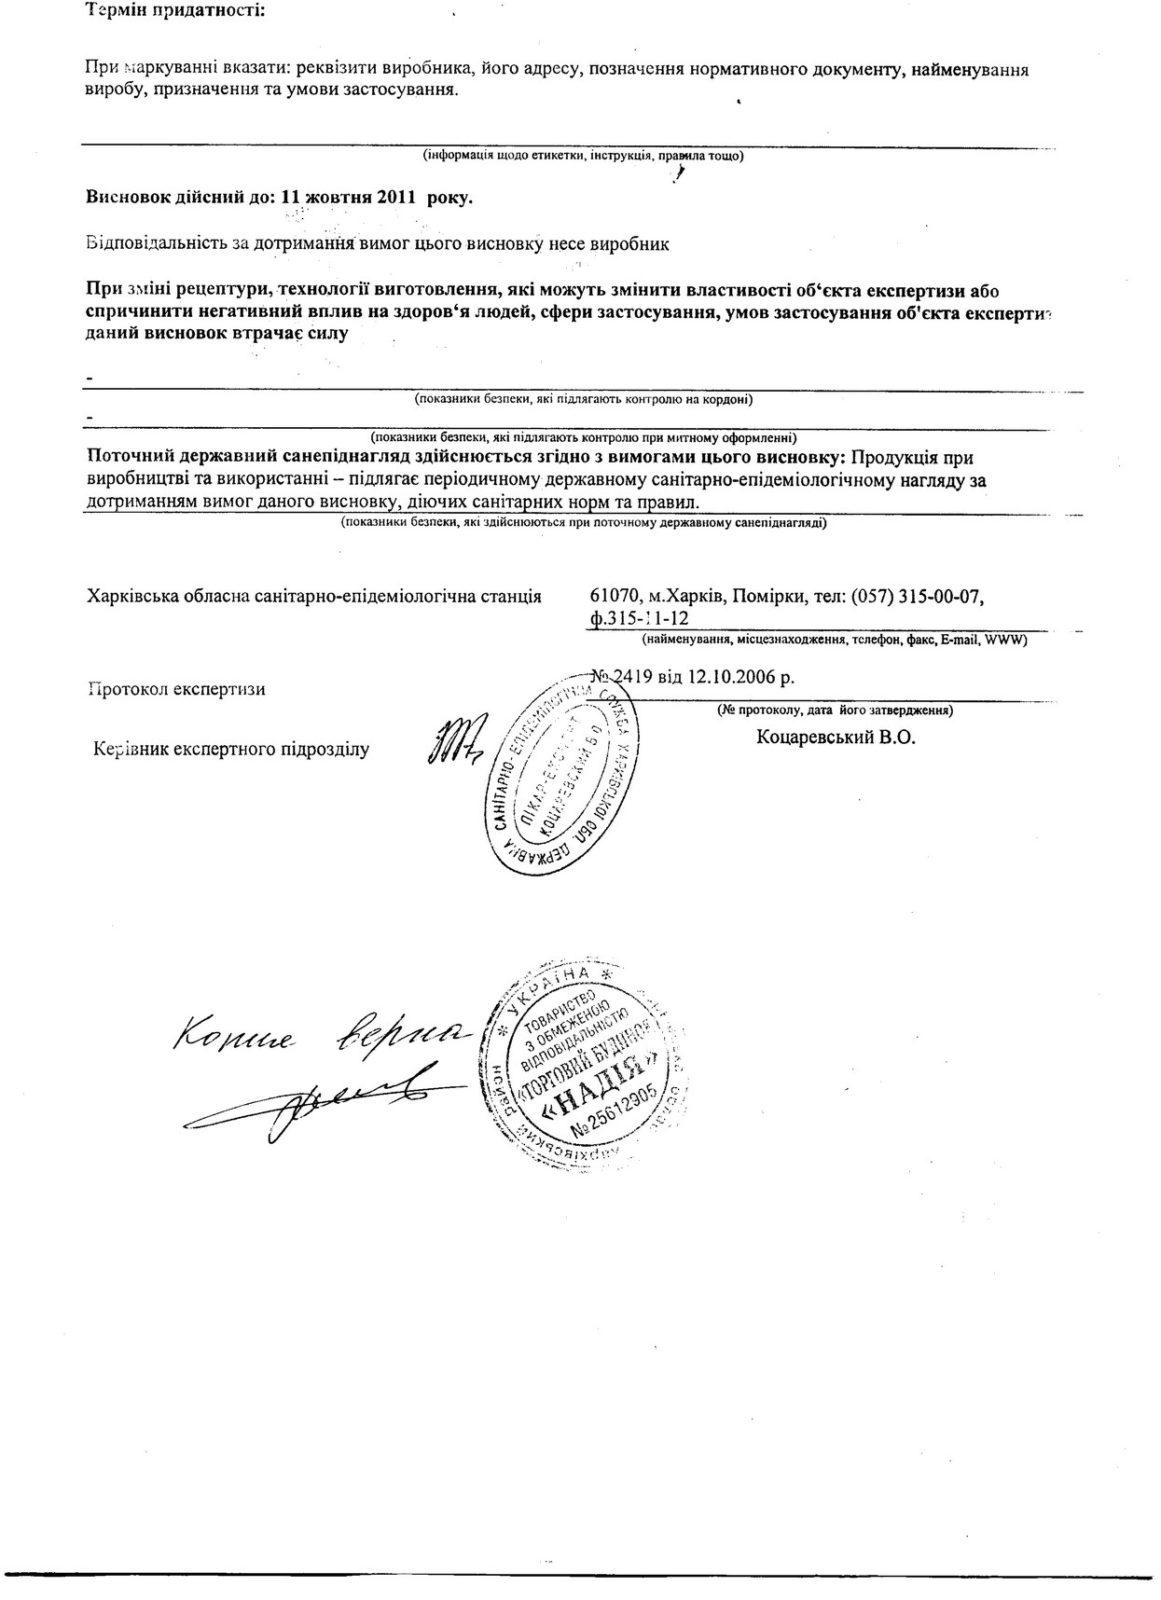 Visnovok_SES_pogonajnie_profili_2_big